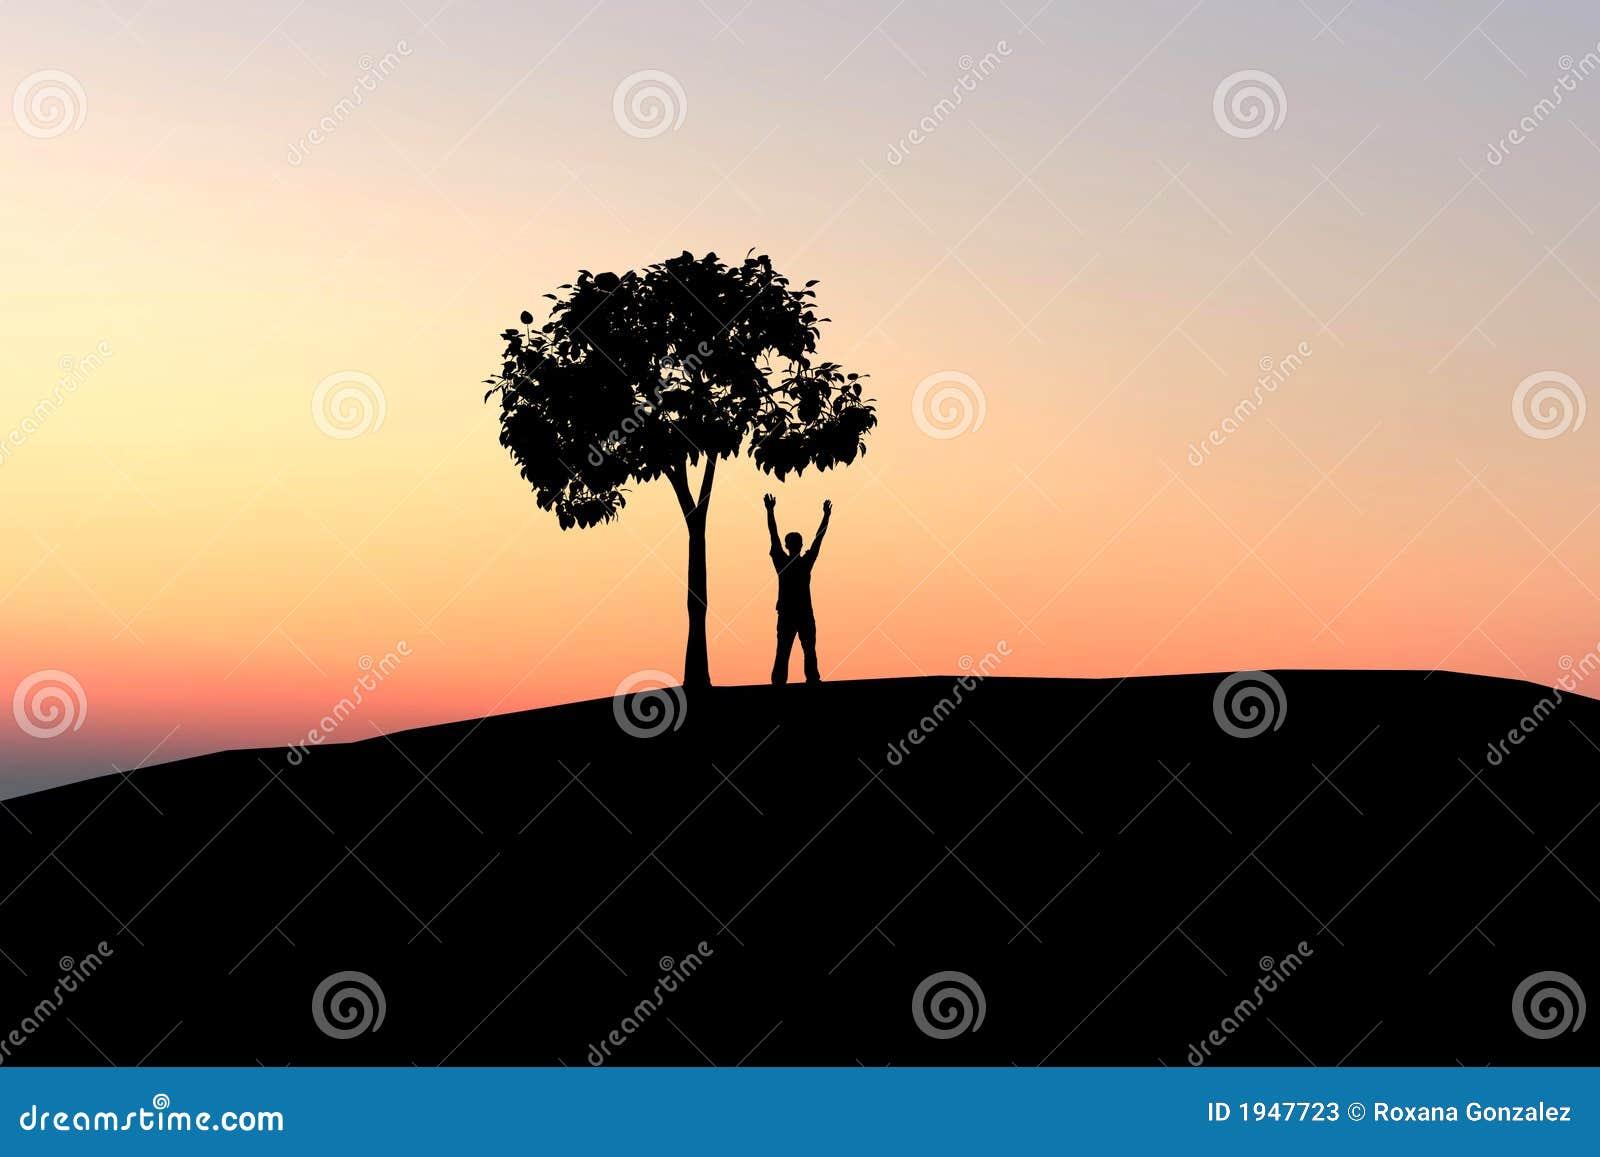 the tree of man pdf